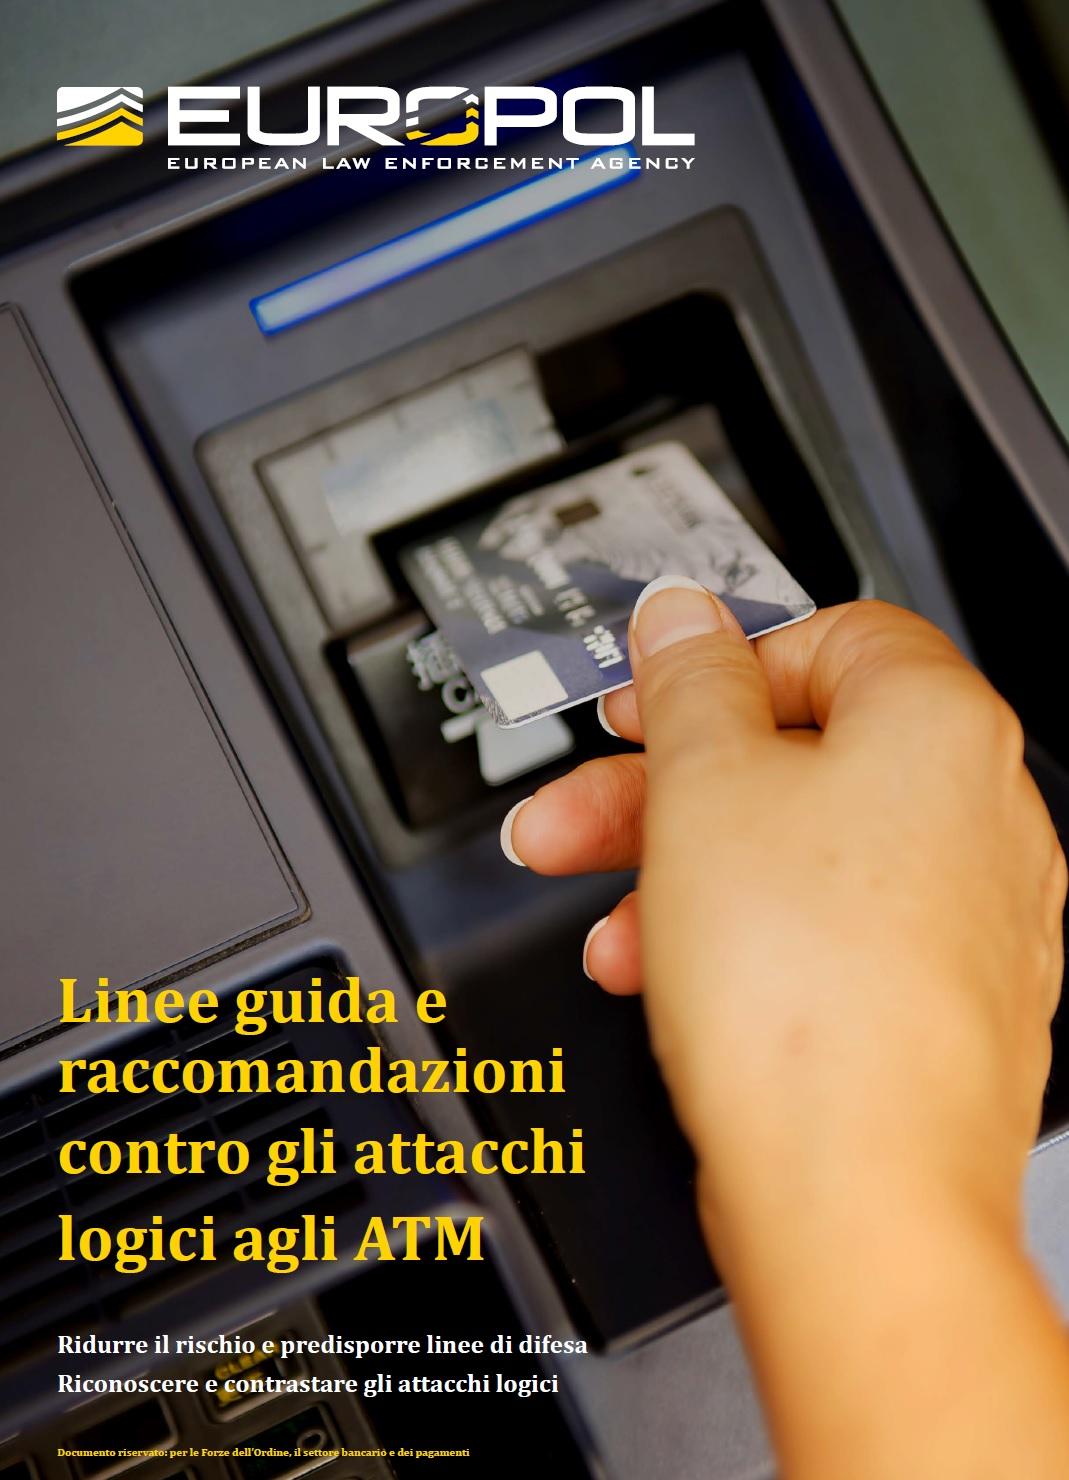 ATM Malware Guidelines - Italian